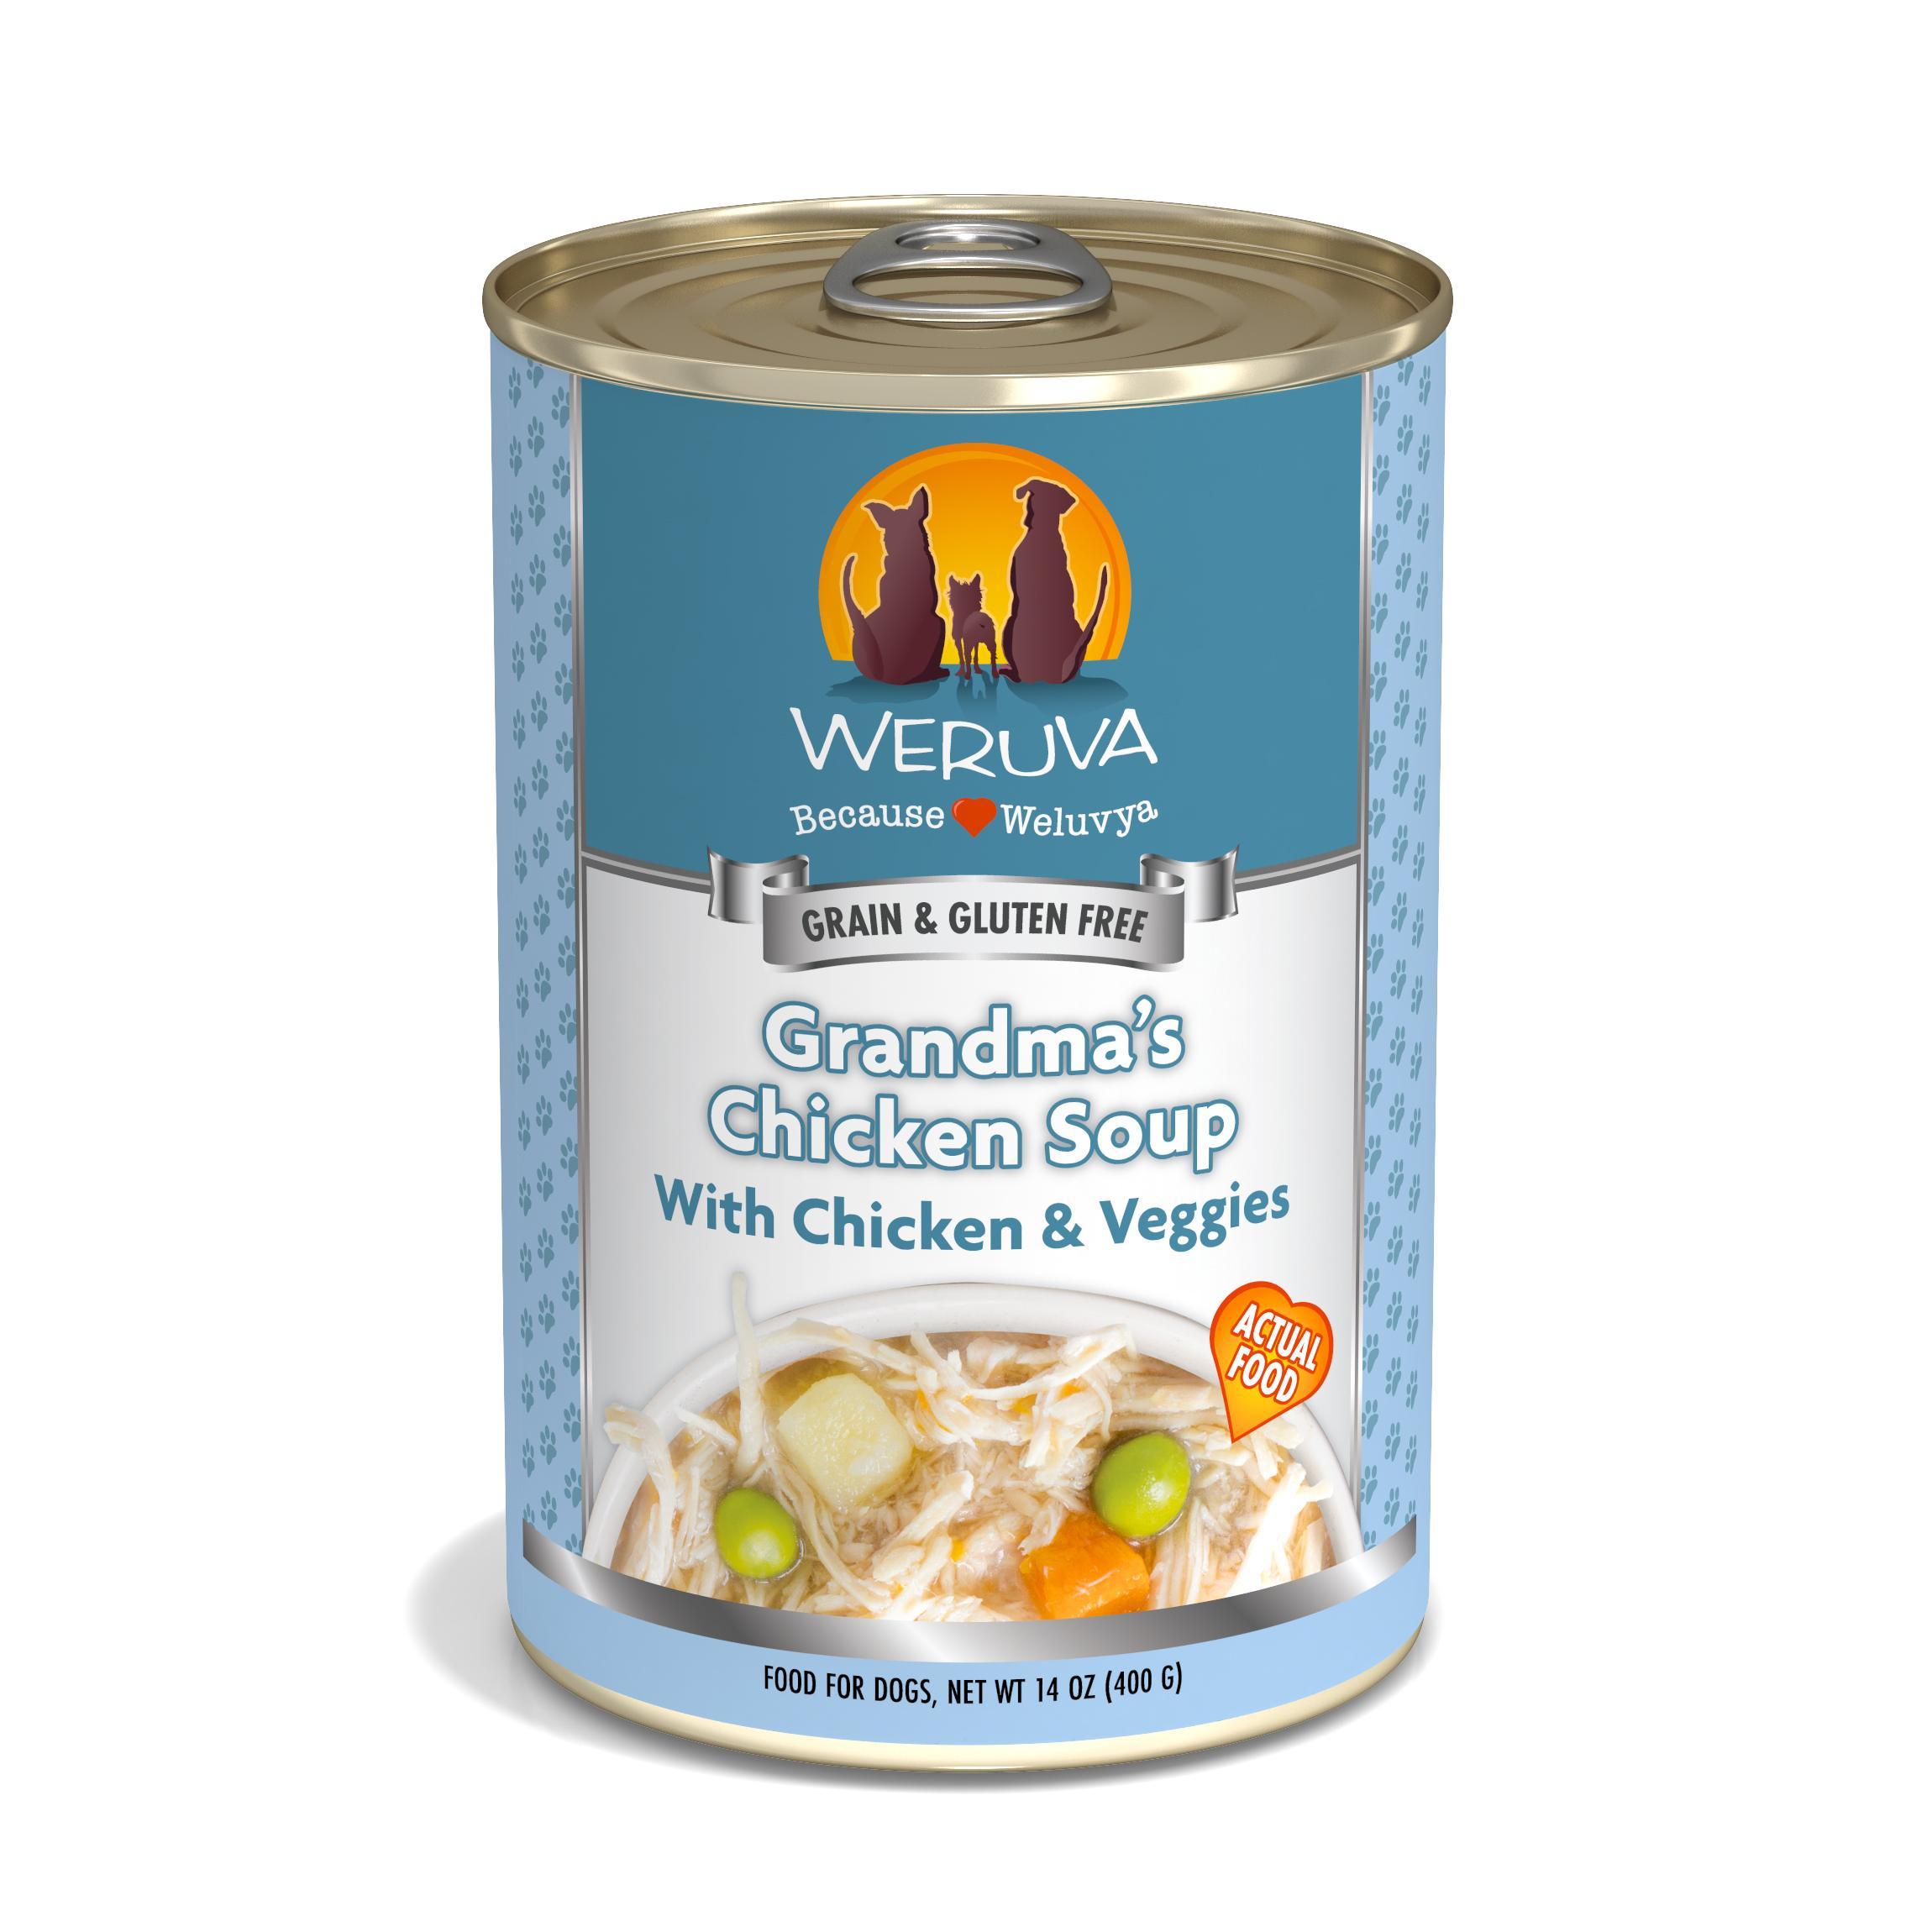 Weruva Dog Classic Grandma's Chicken Soup with Chicken& Veggies Grain-Free Wet Dog Food, 14-oz